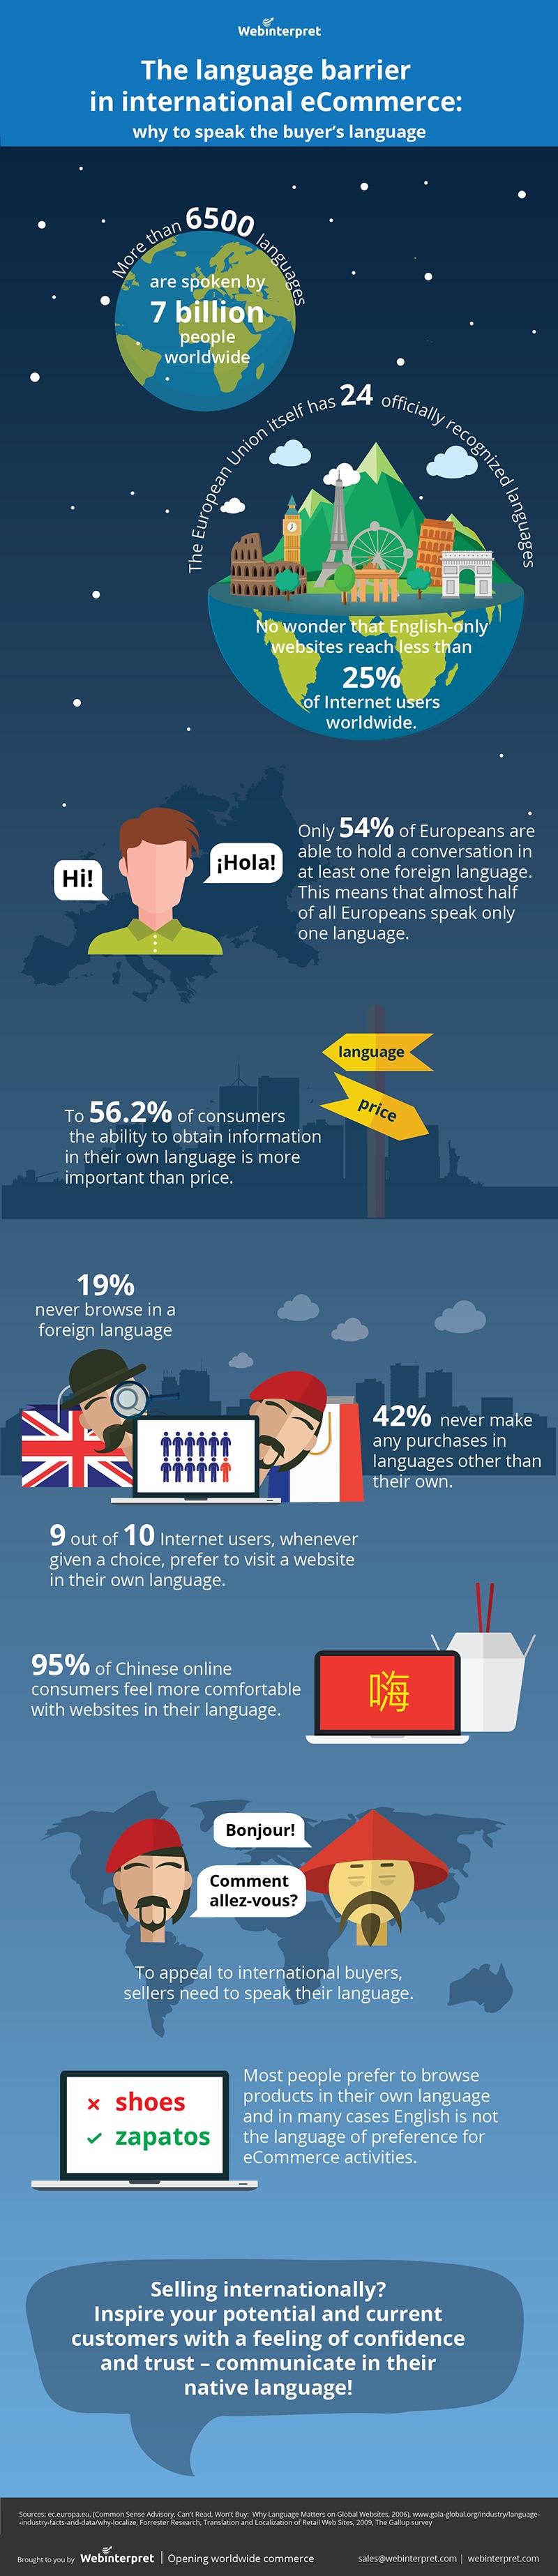 language-barrier-international-ecommerce